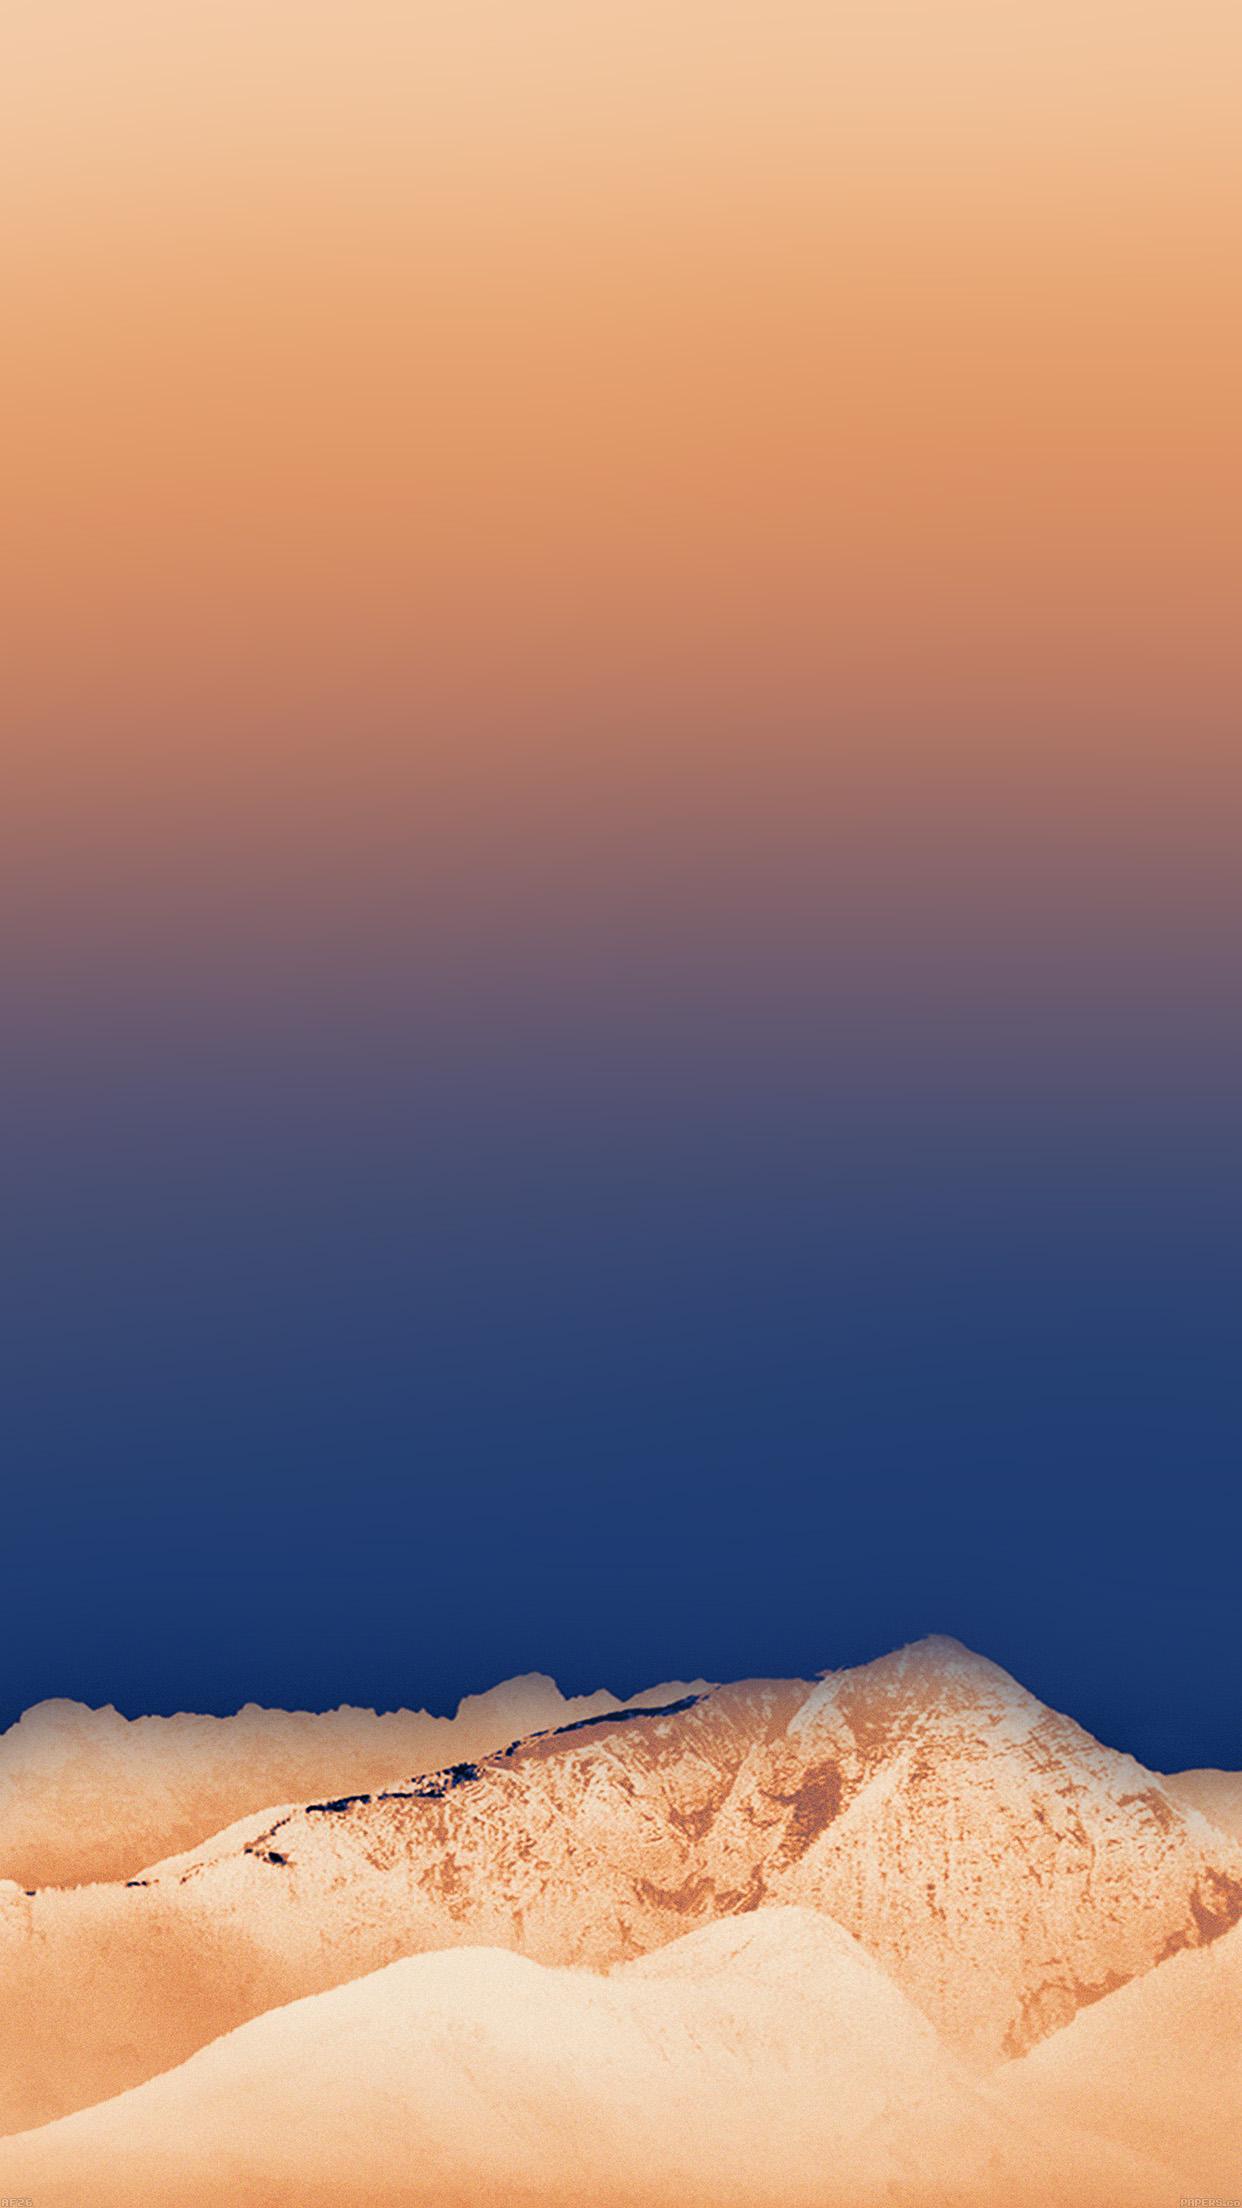 iphone 6 wallpaper retina mountain - photo #40